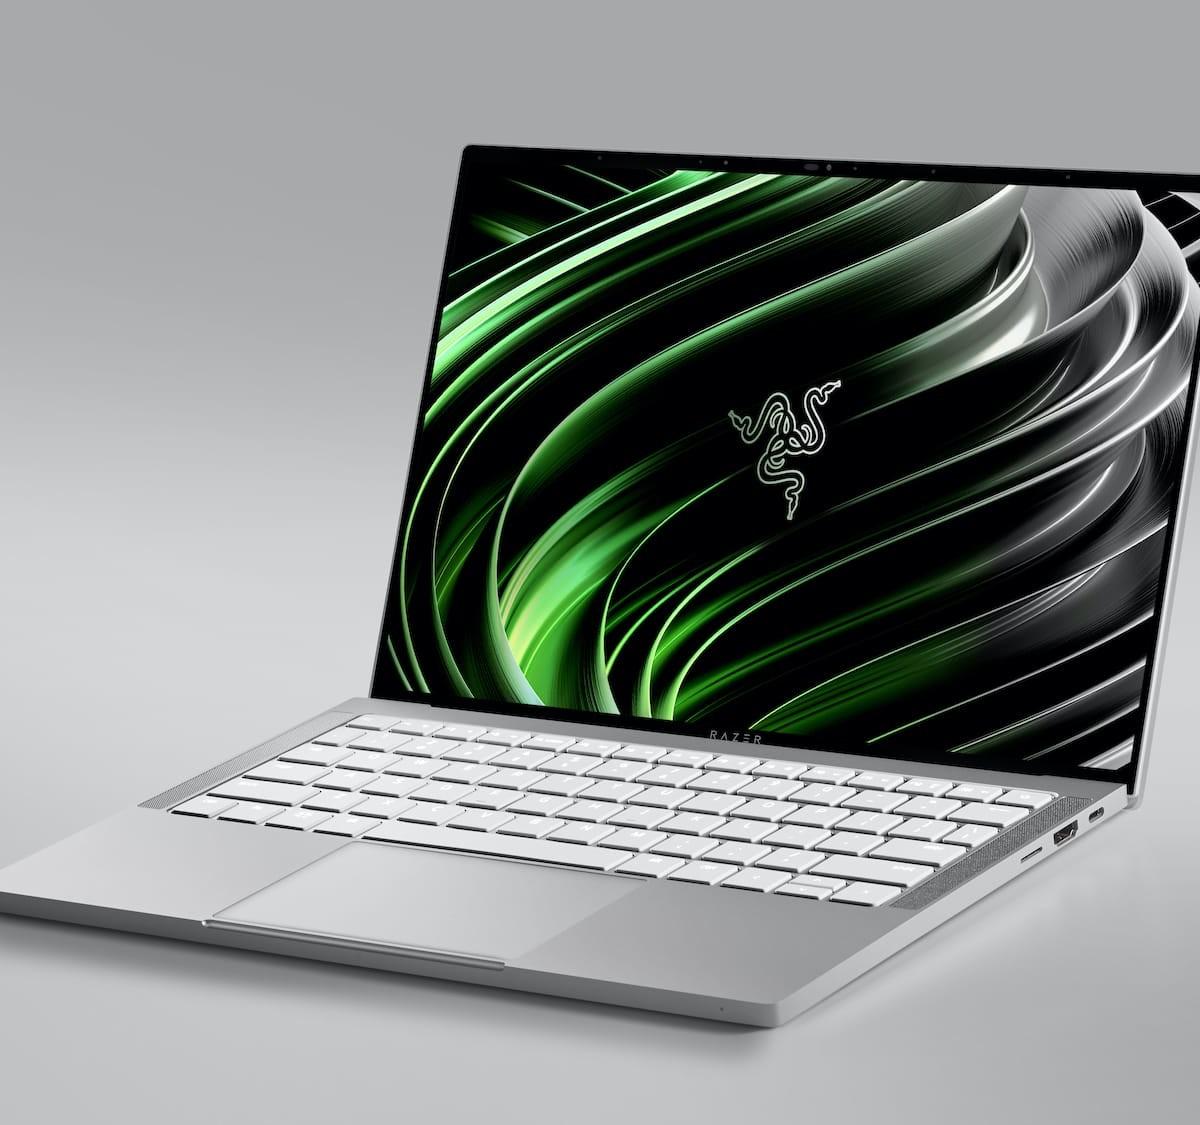 Razer Book 13 productivity laptop has a compact, portable design for easy mobility